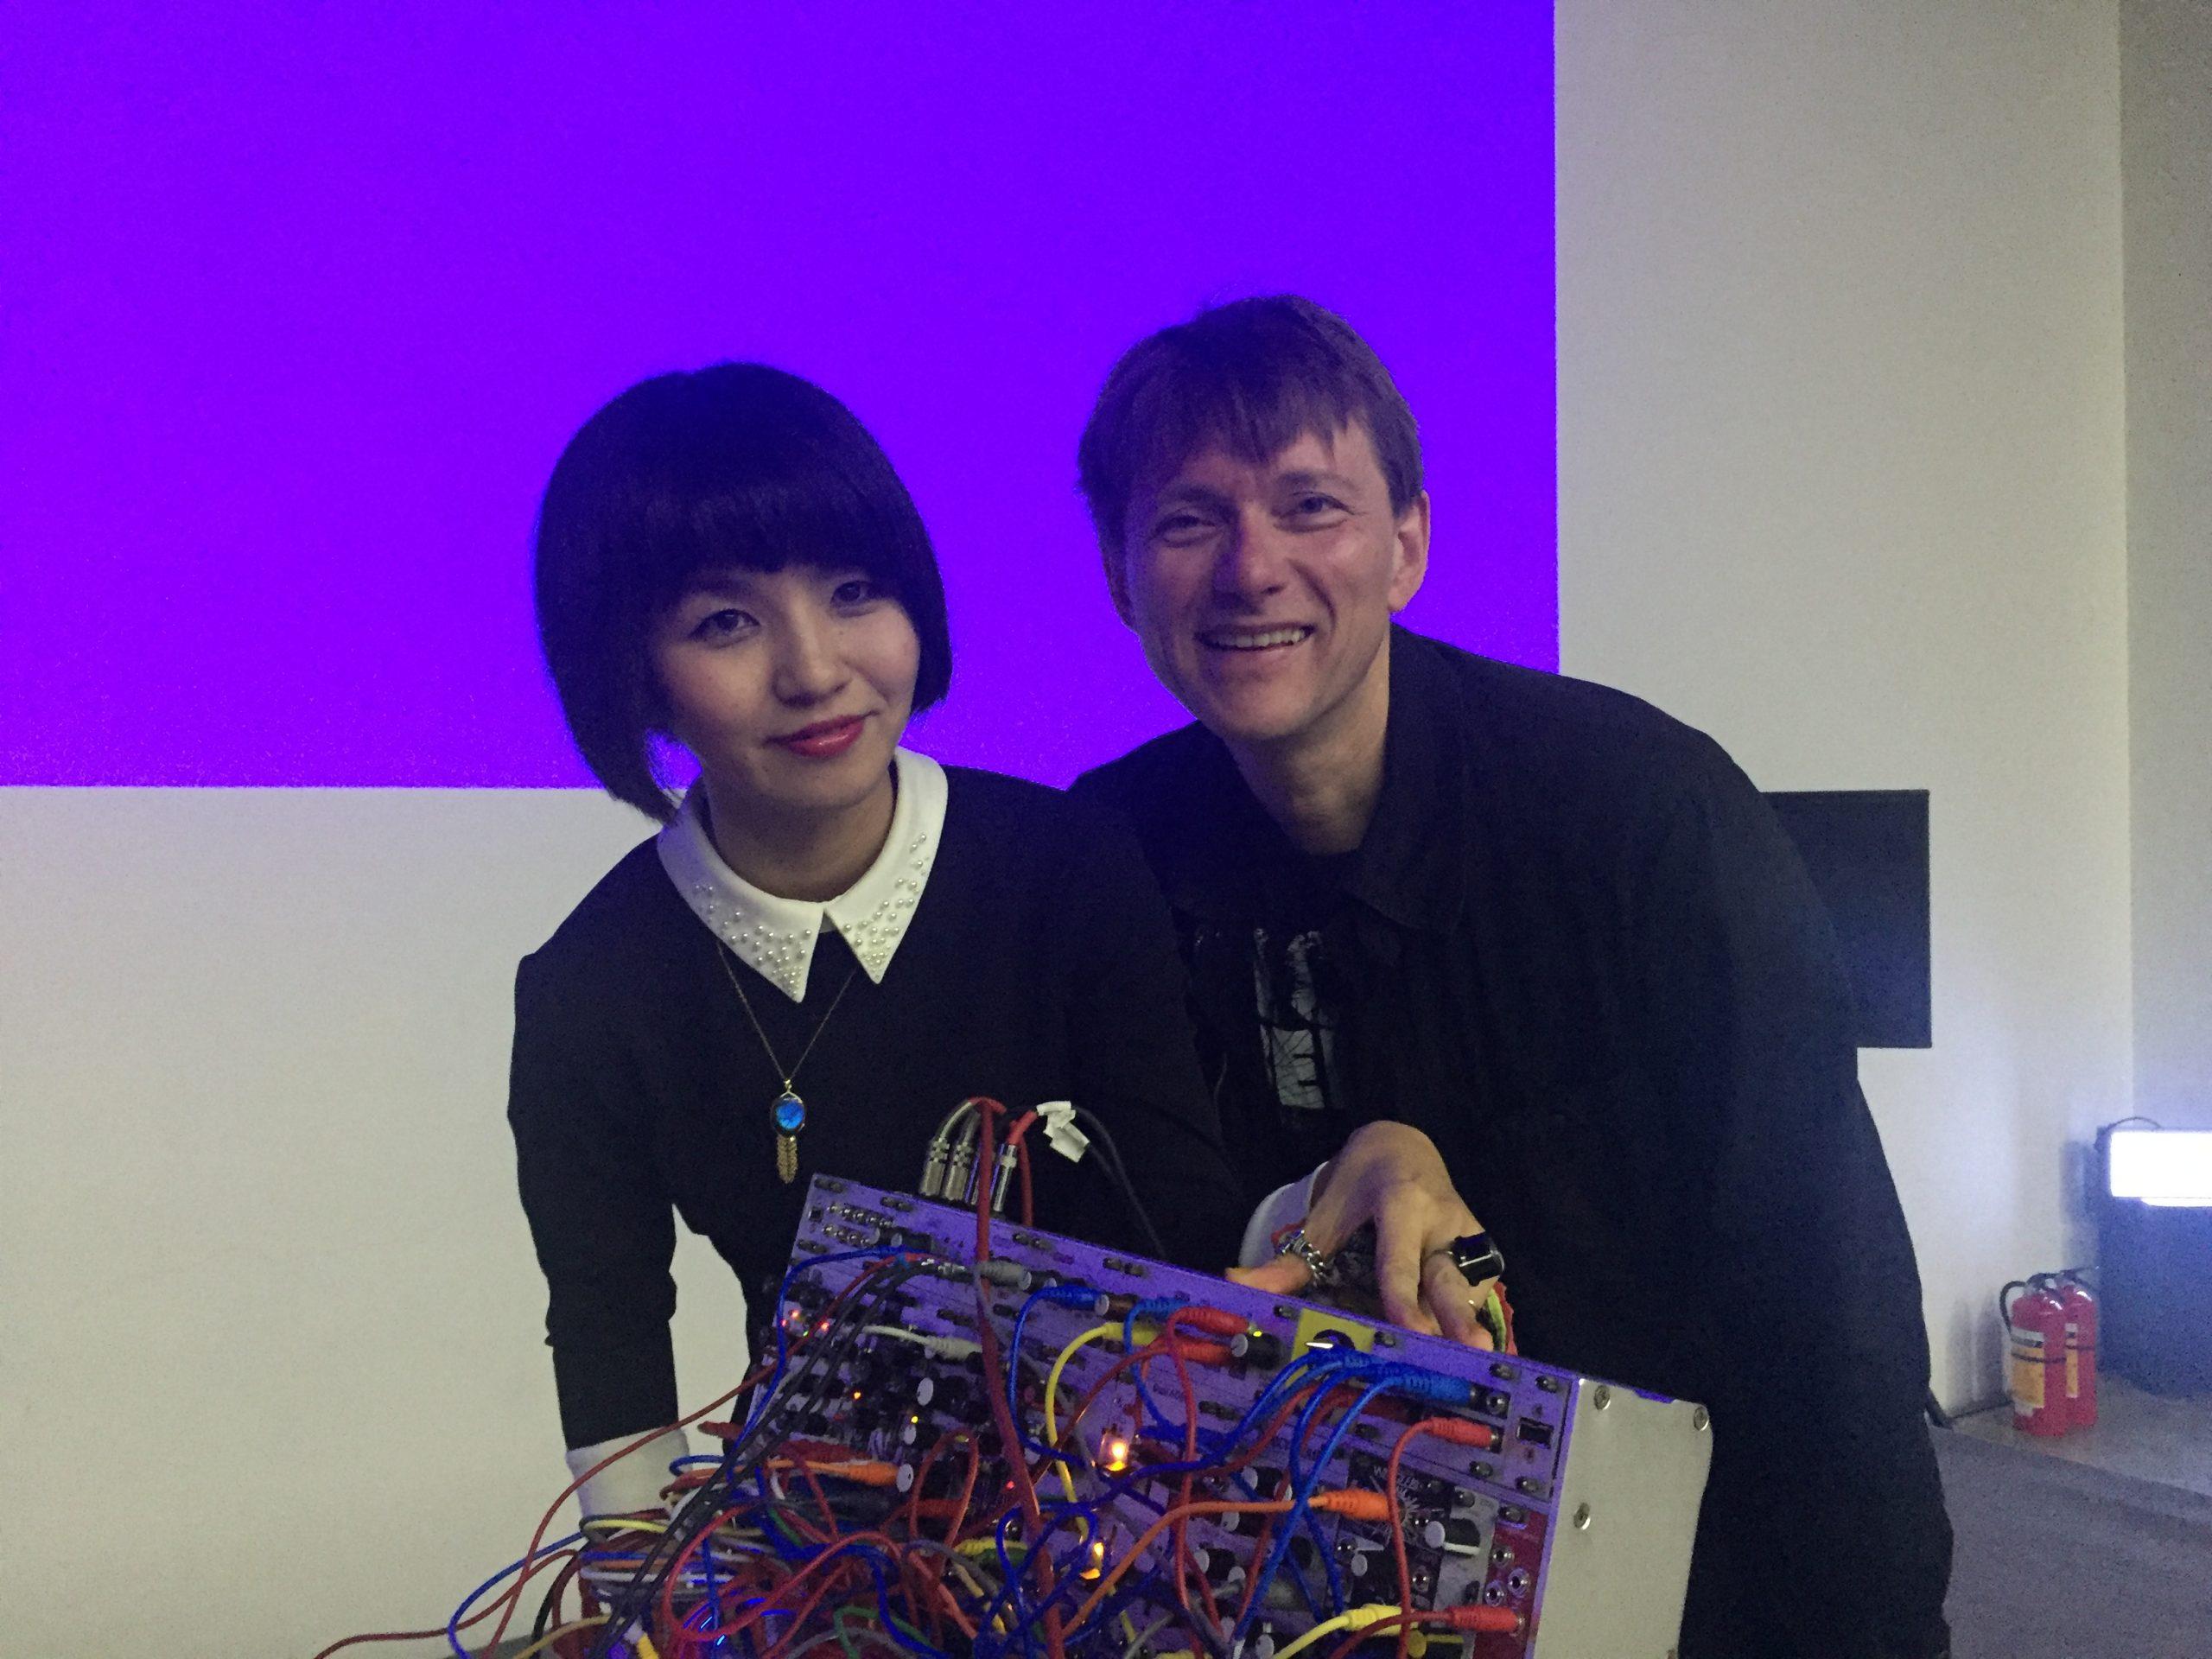 Galcid and Mijk van Dijk in Shenzhen/ China, December 2017